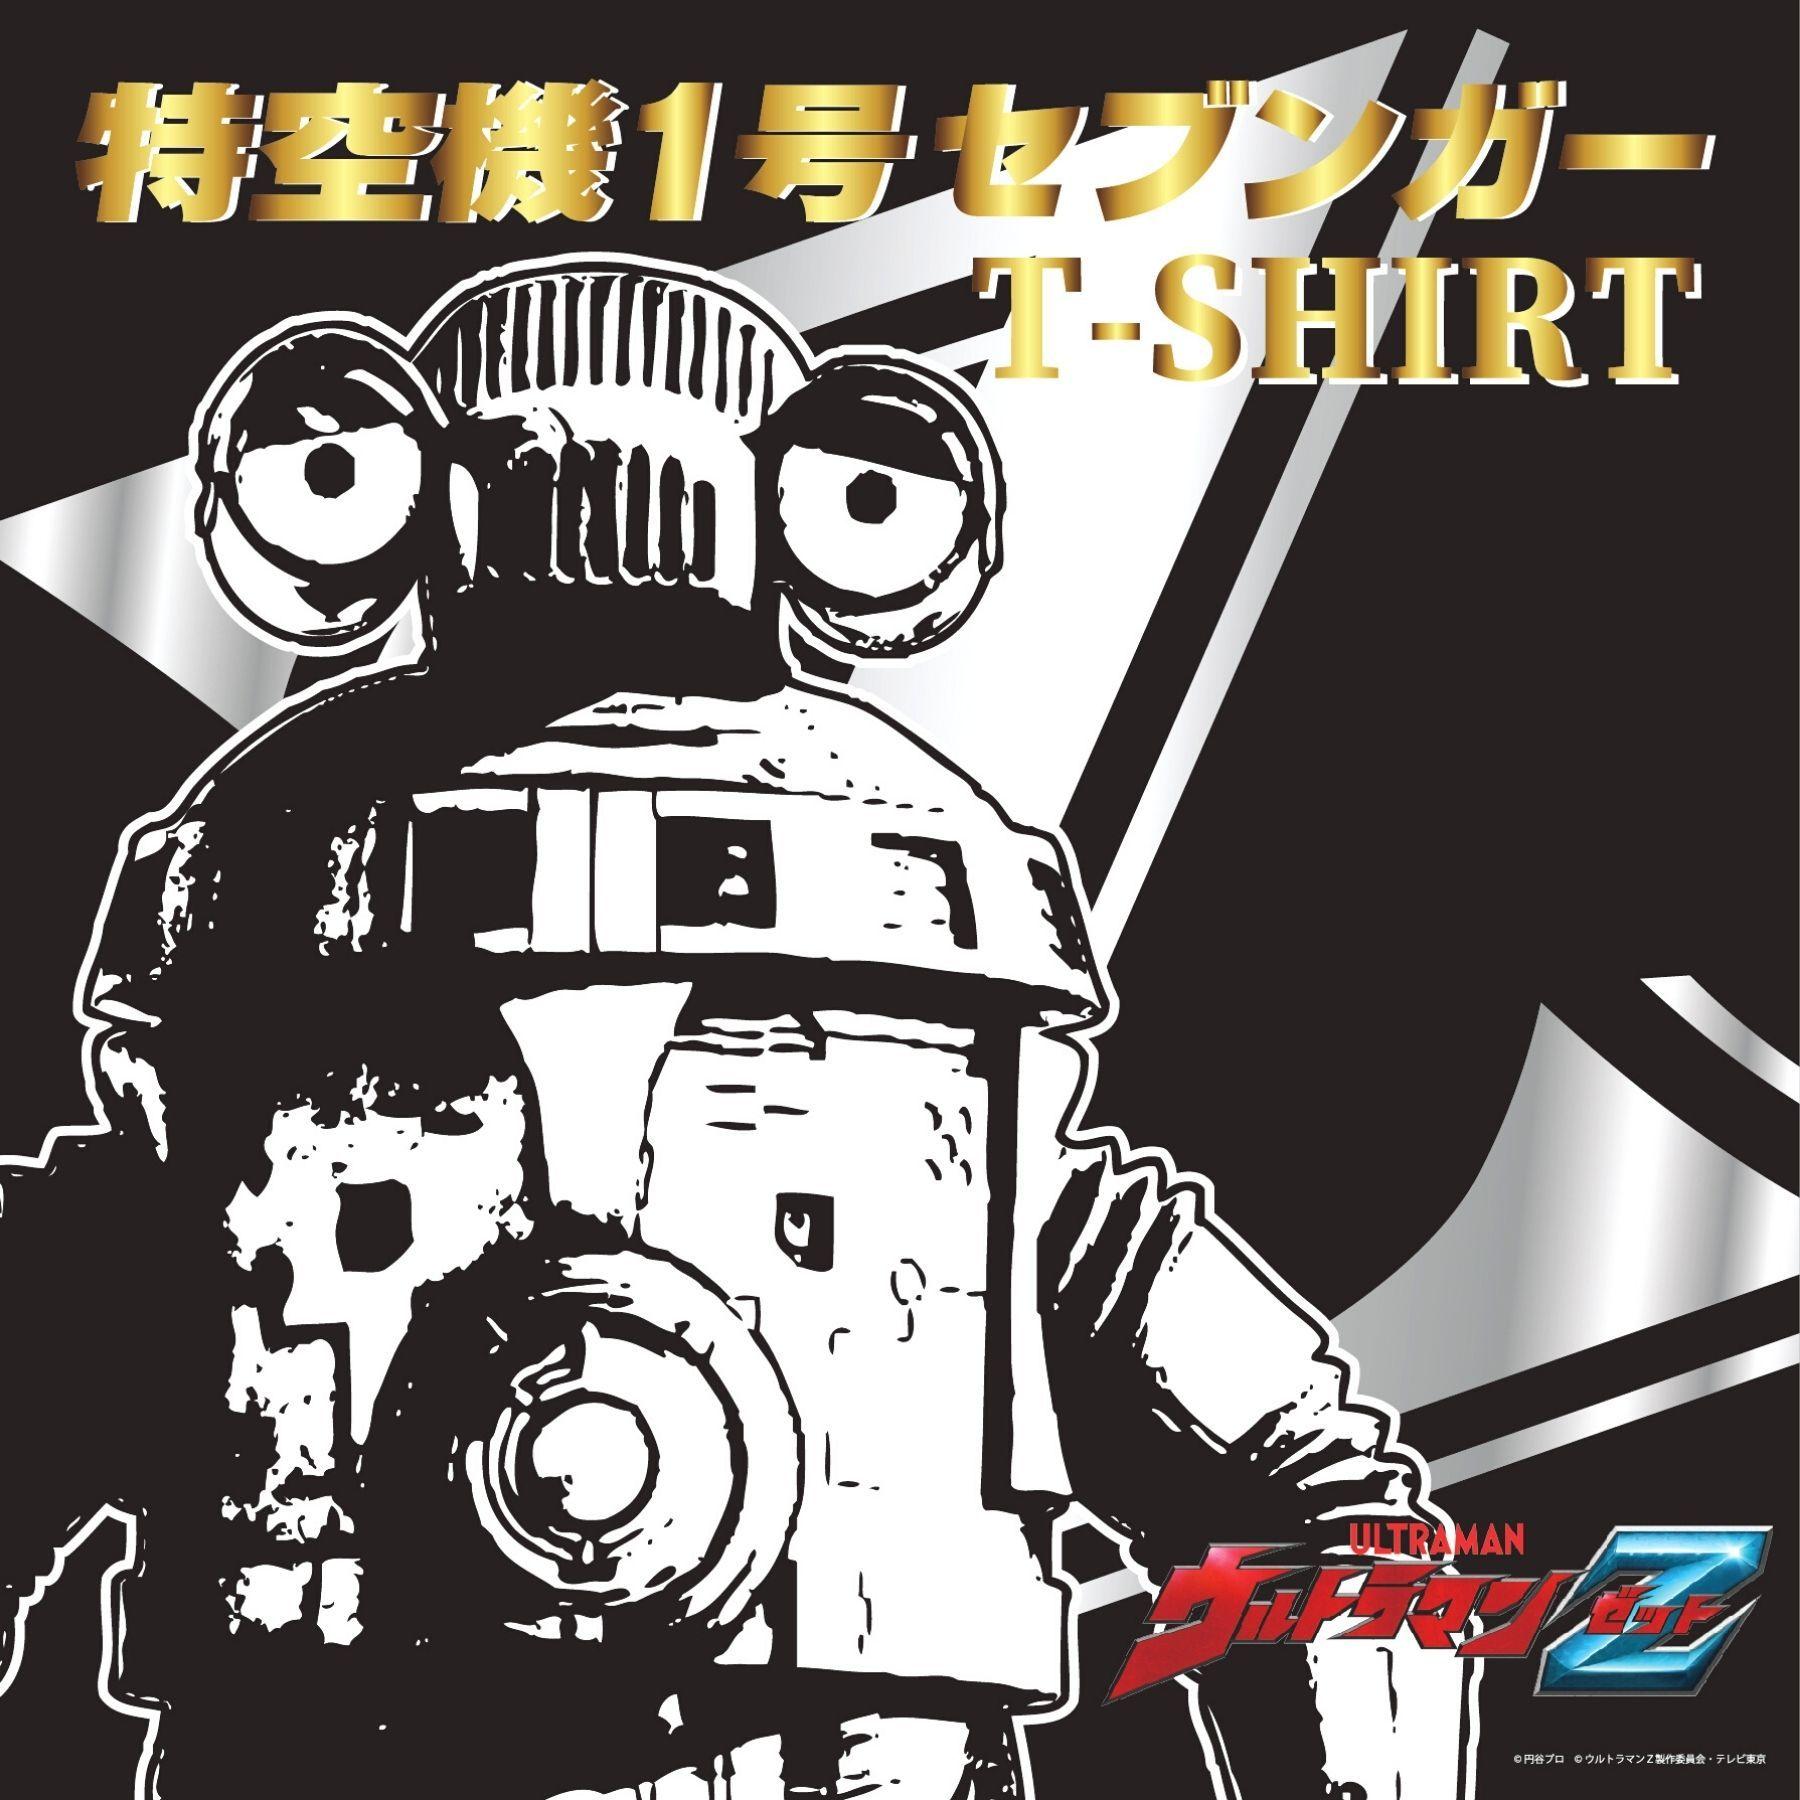 Special Airborne Armor 1 Sevenger T-shirt—Ultraman Z